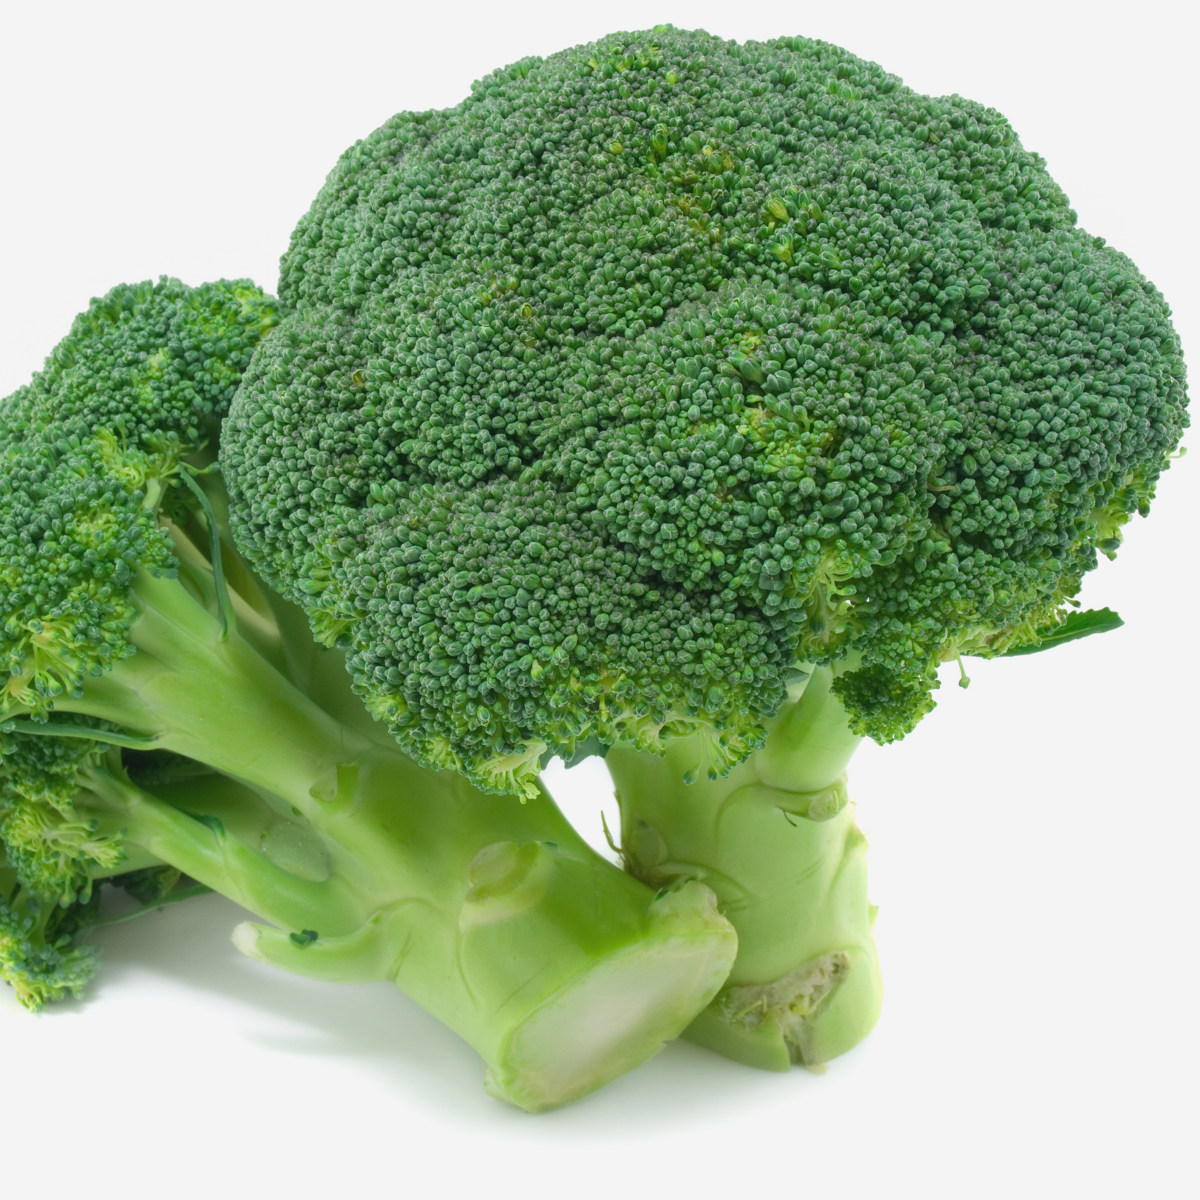 5-alimentos-mais-nutritivos-para-bebes-brocolis